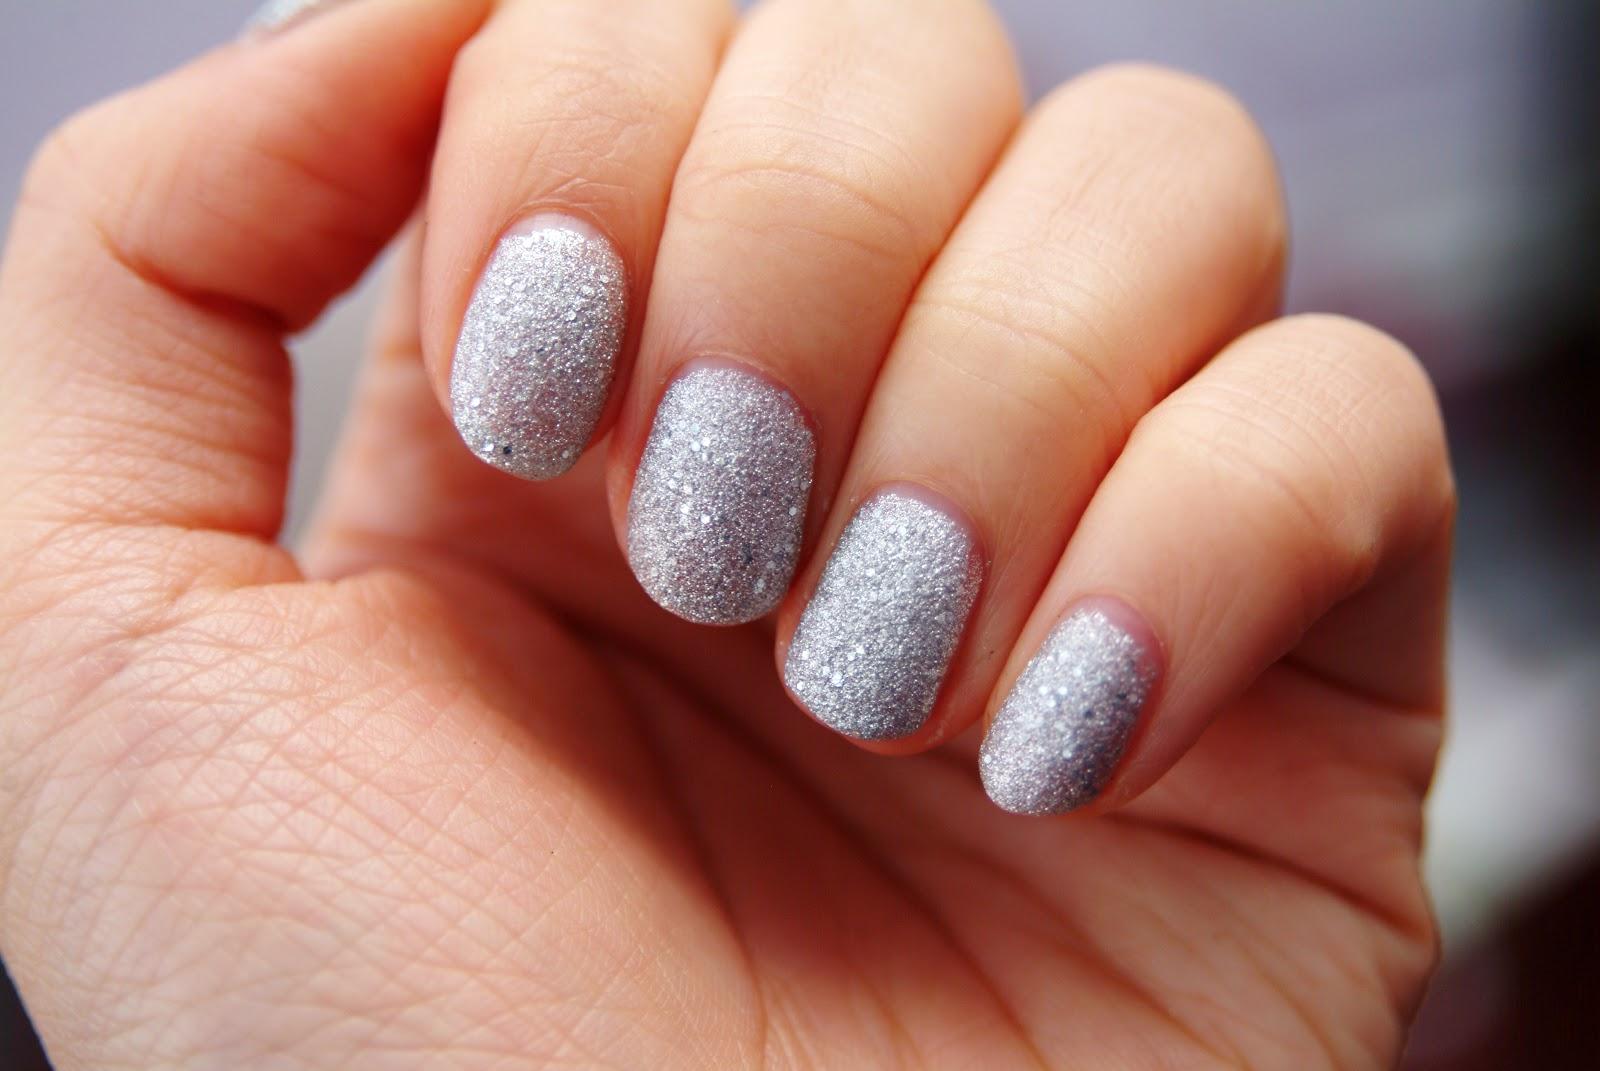 Modern Diamond Dust Nails Images - Nail Art Ideas - morihati.com